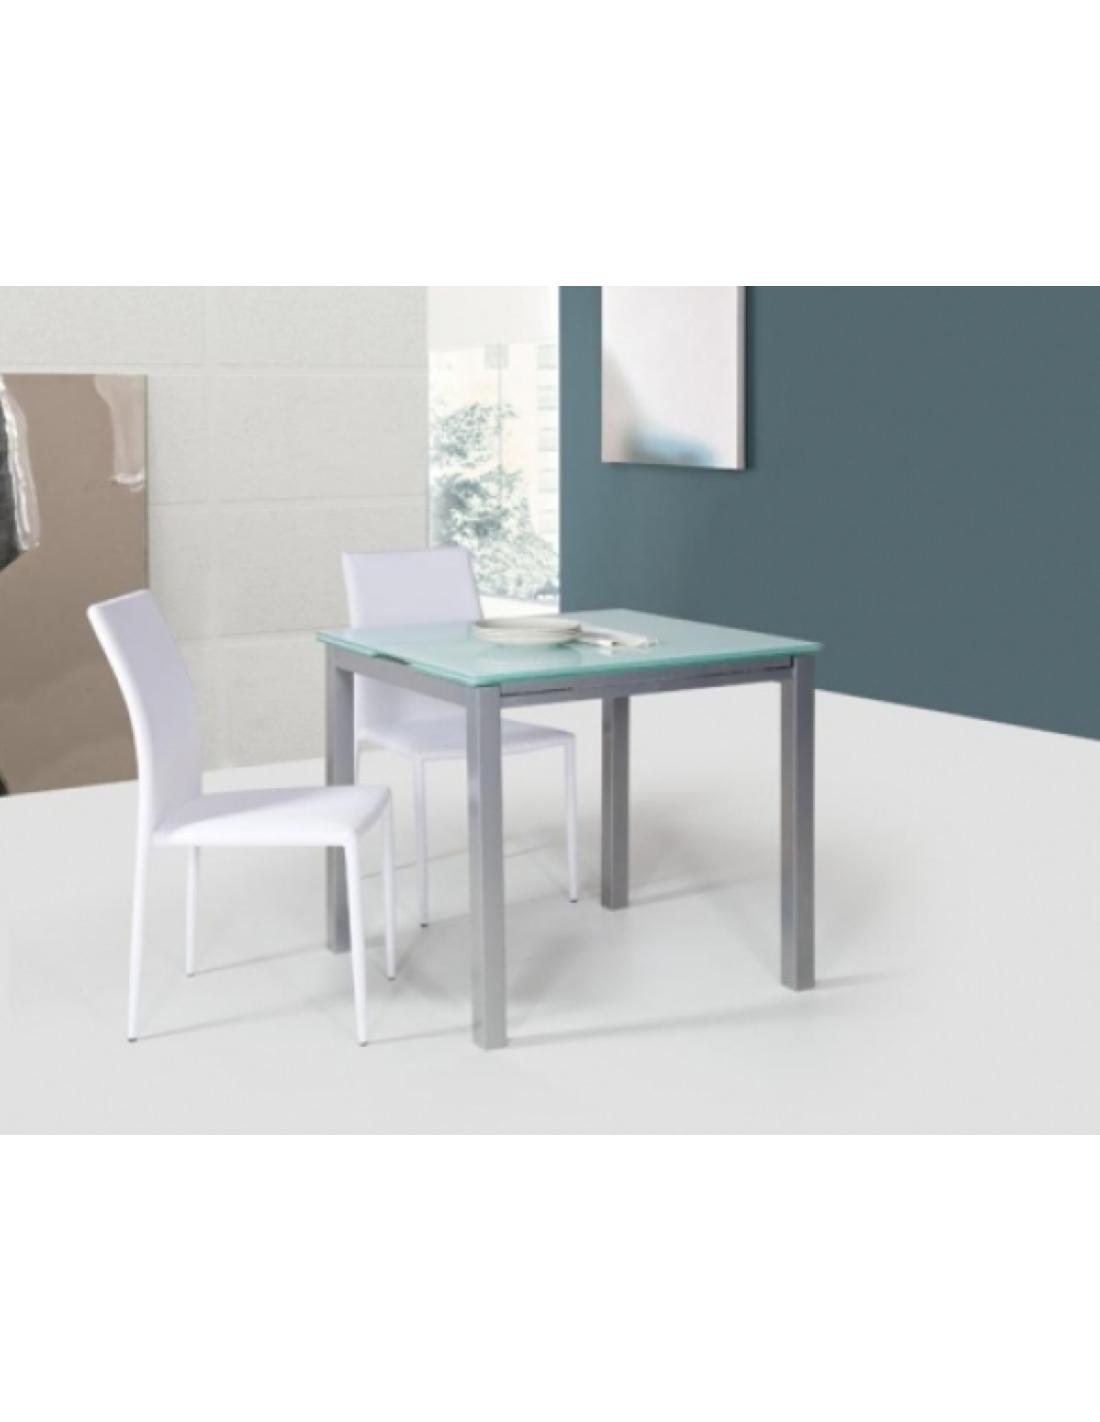 Best Tavolo 80x80 Allungabile Images - Idee Arredamento Casa ...